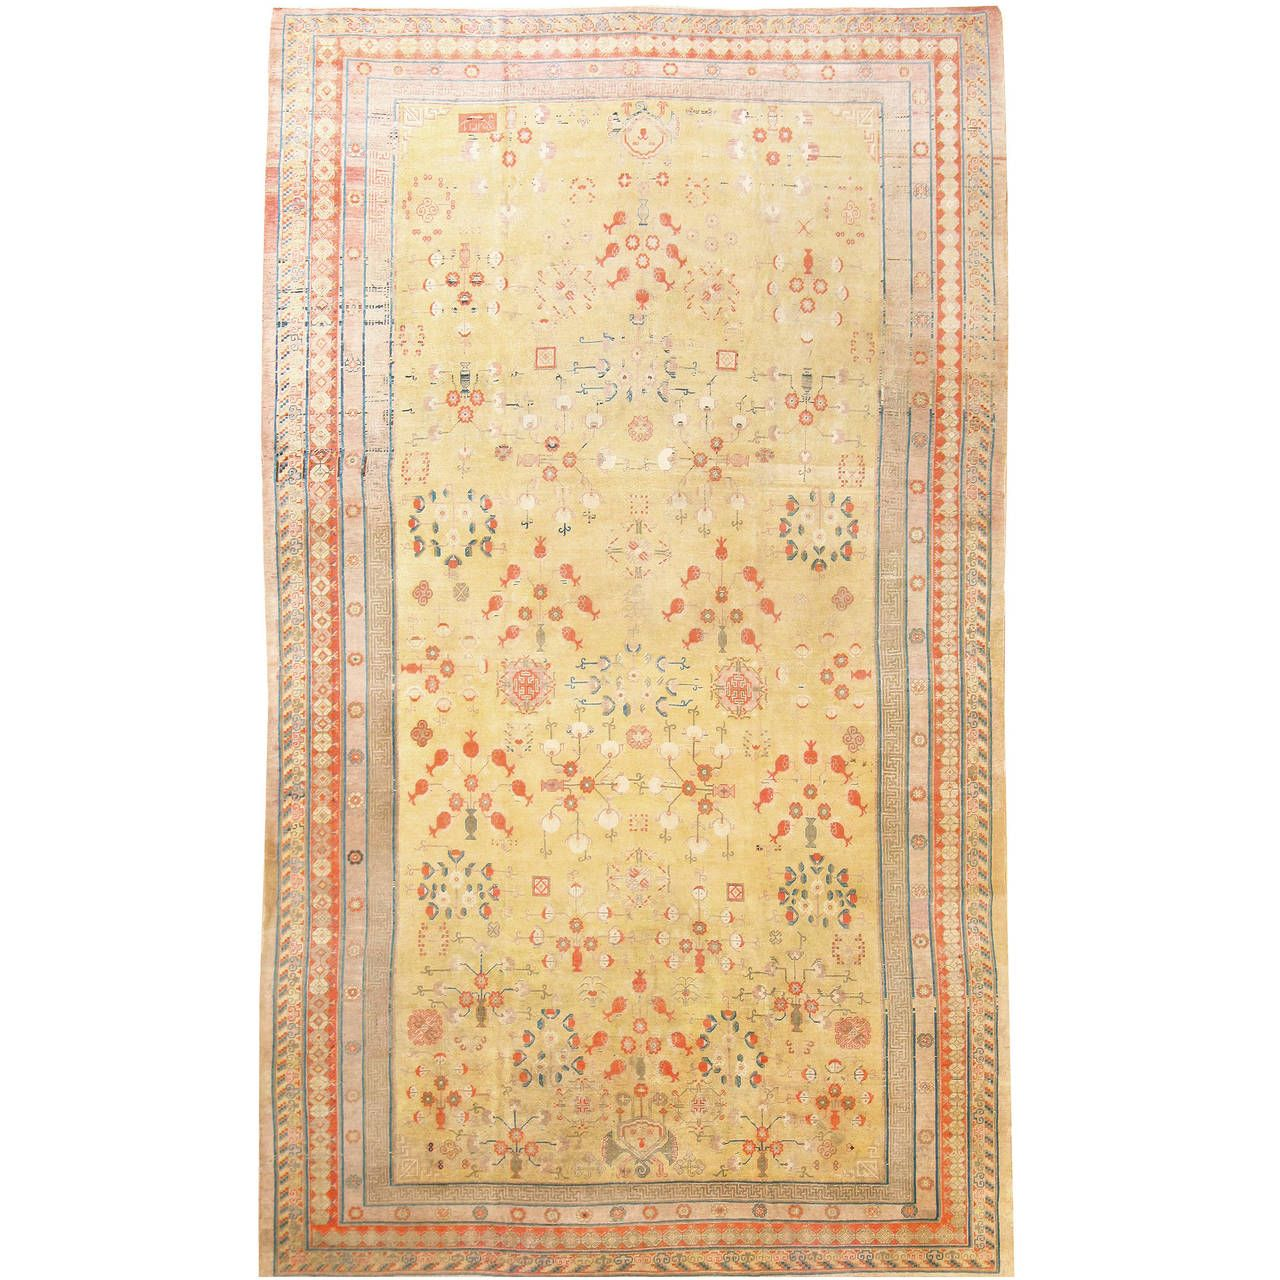 Breathtaking Rare Oversize Antique Khotan Rug 50200 Asian Rugs Rugs On Carpet Rugs